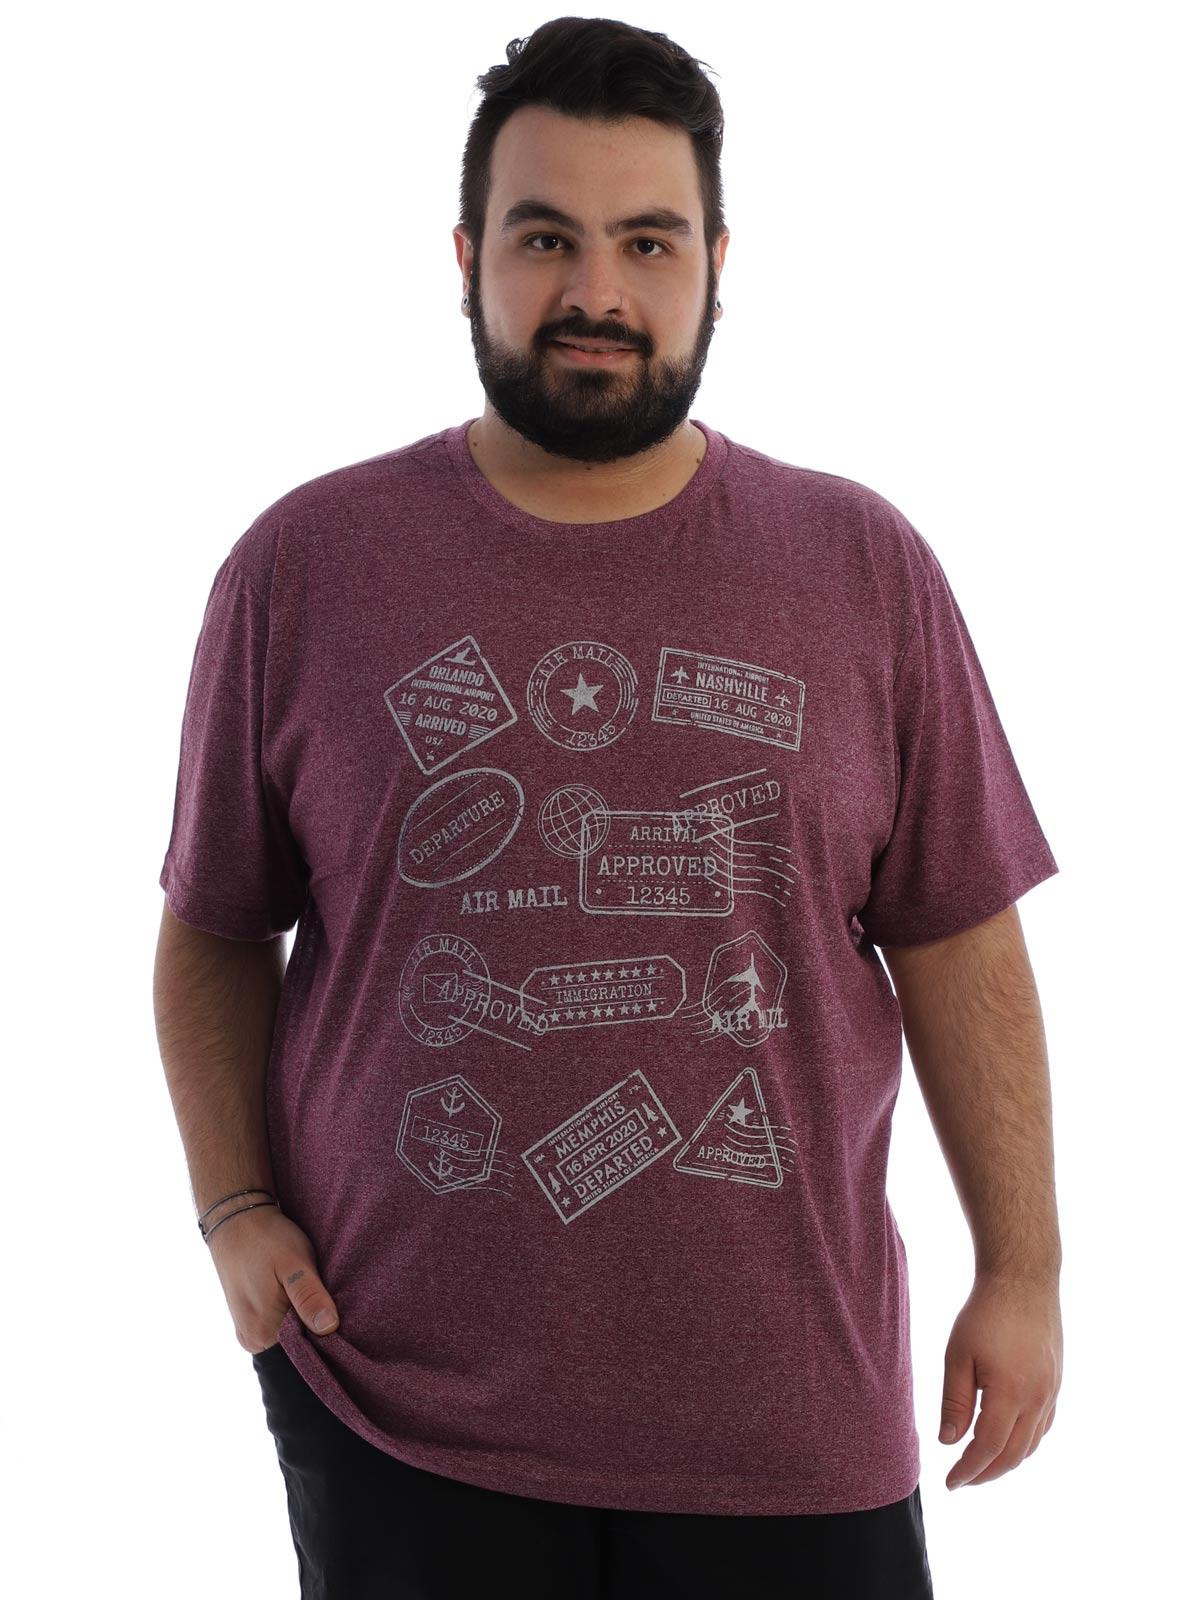 Camiseta Plus Size Masculina Algodão Mouline Nature Bordo